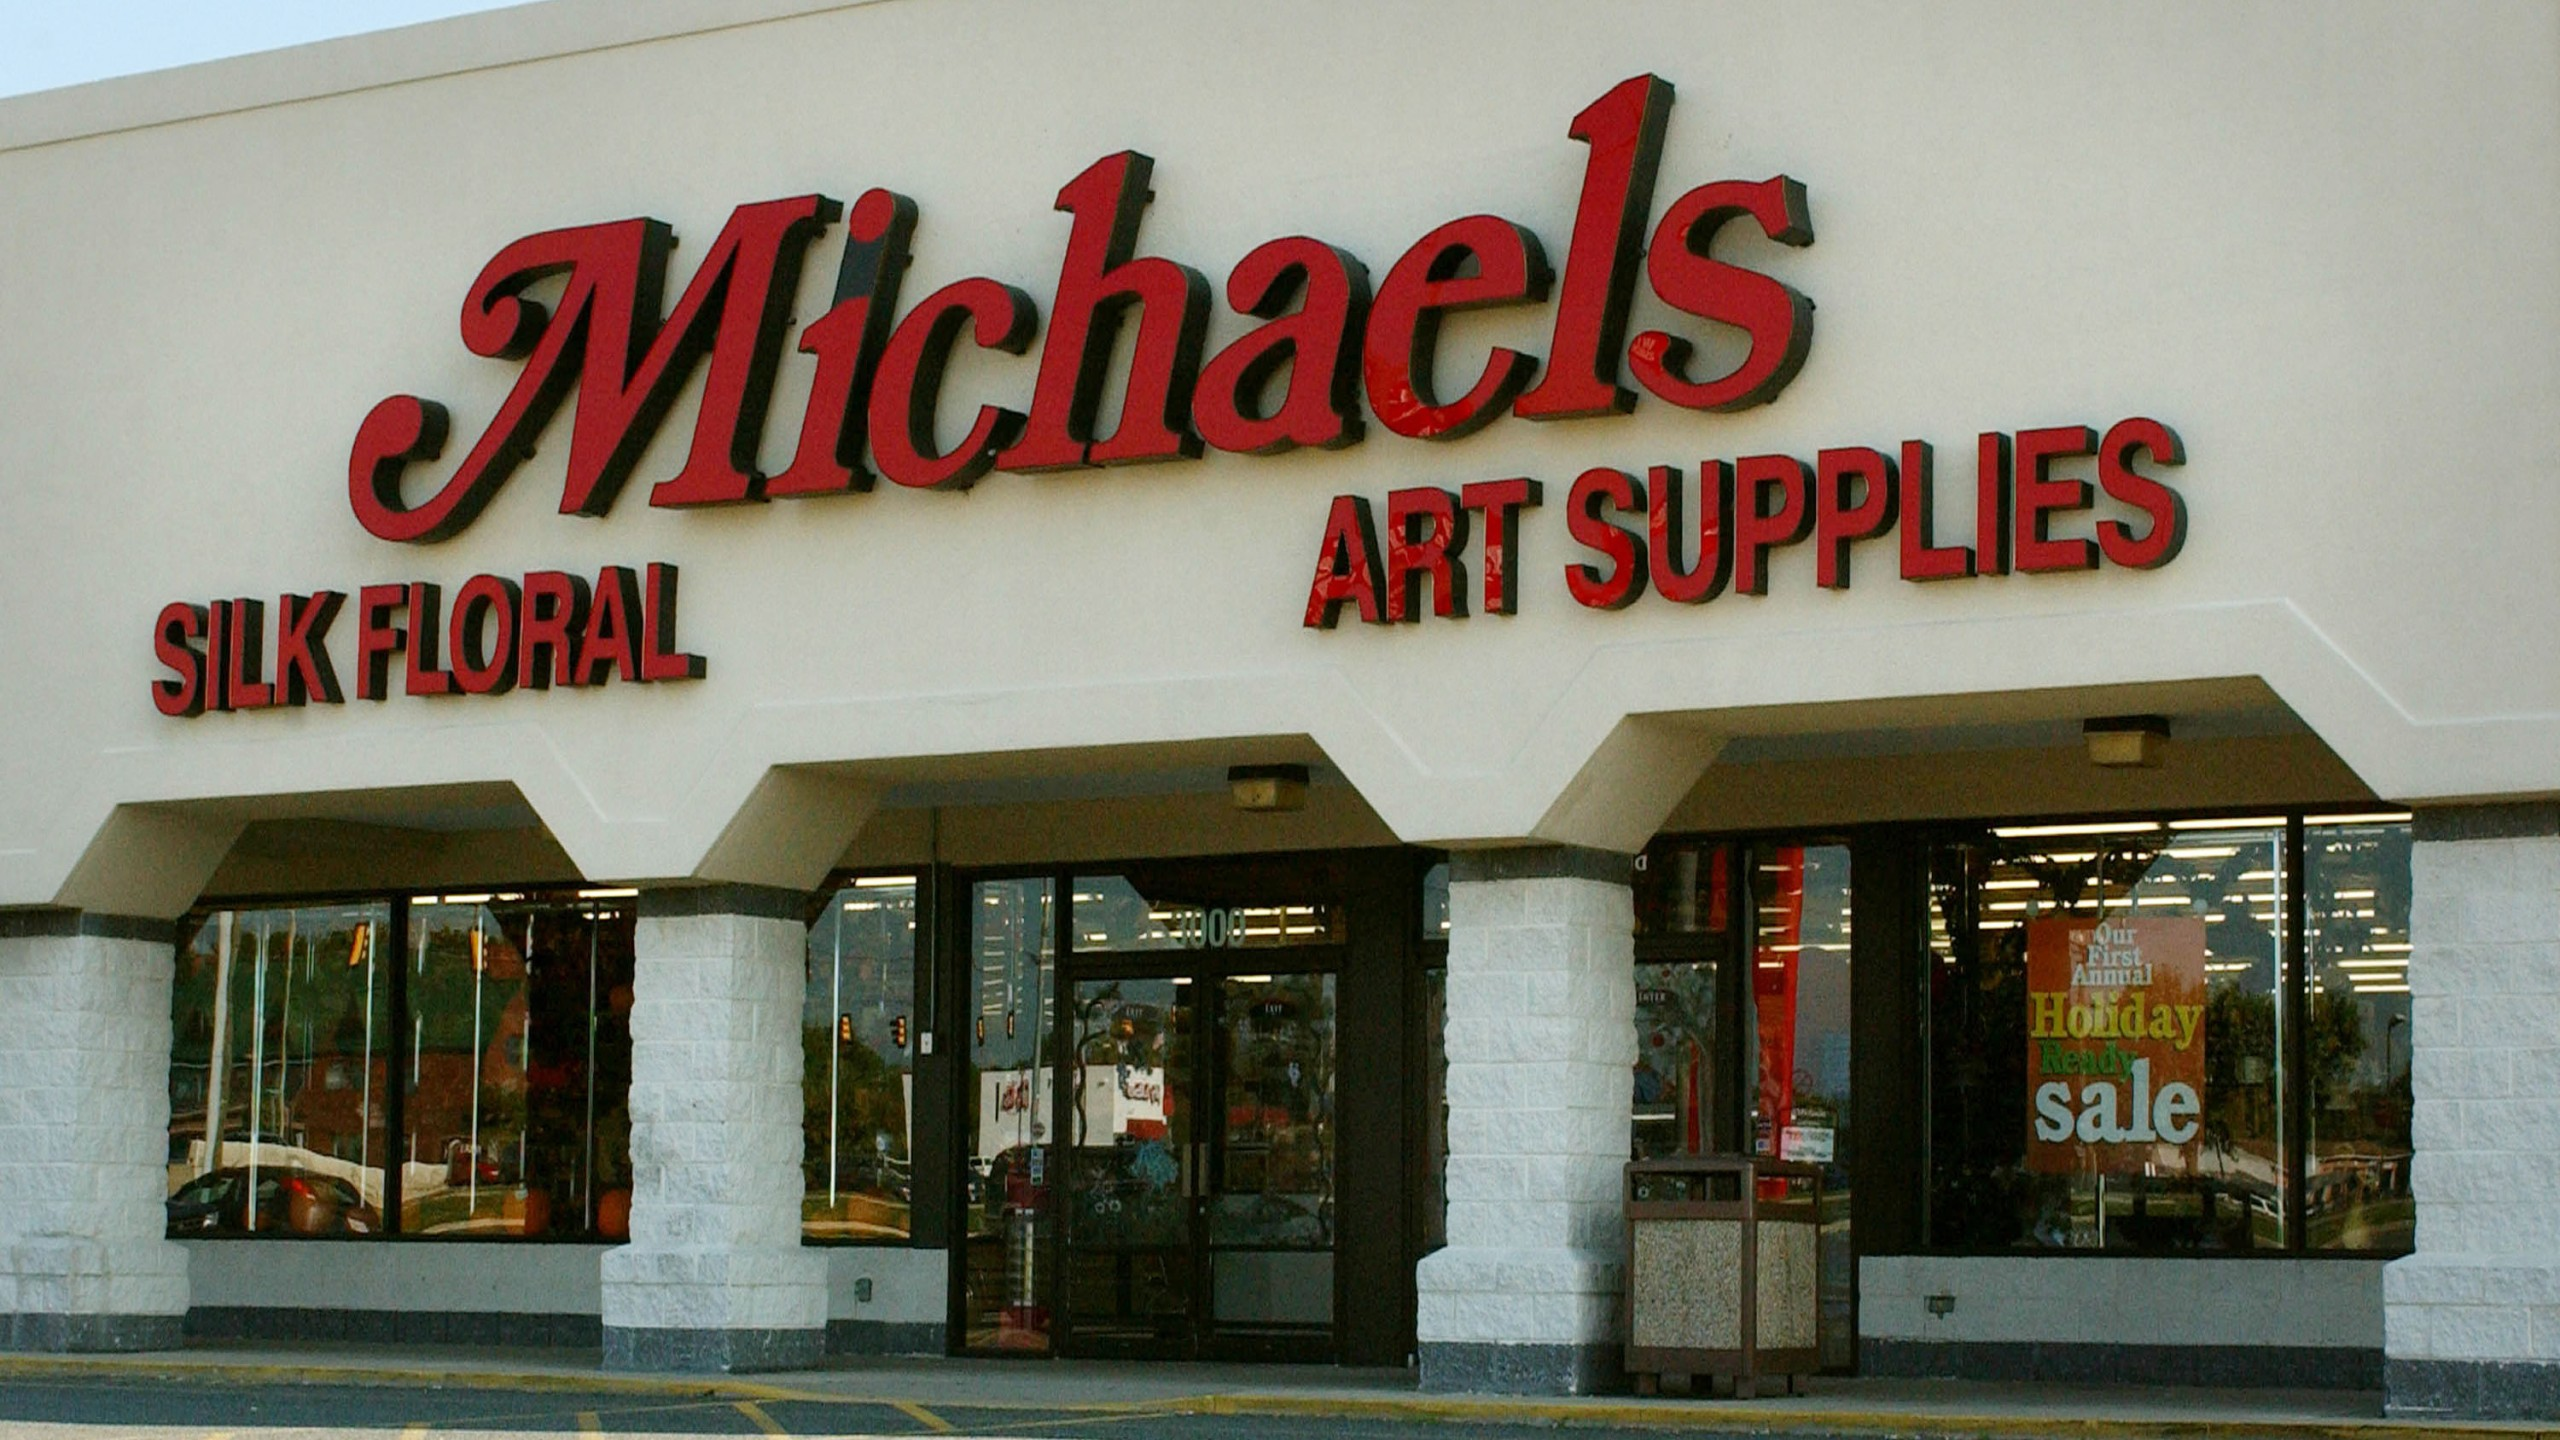 Michaels Craft Store In Fredericksburg, Virginia